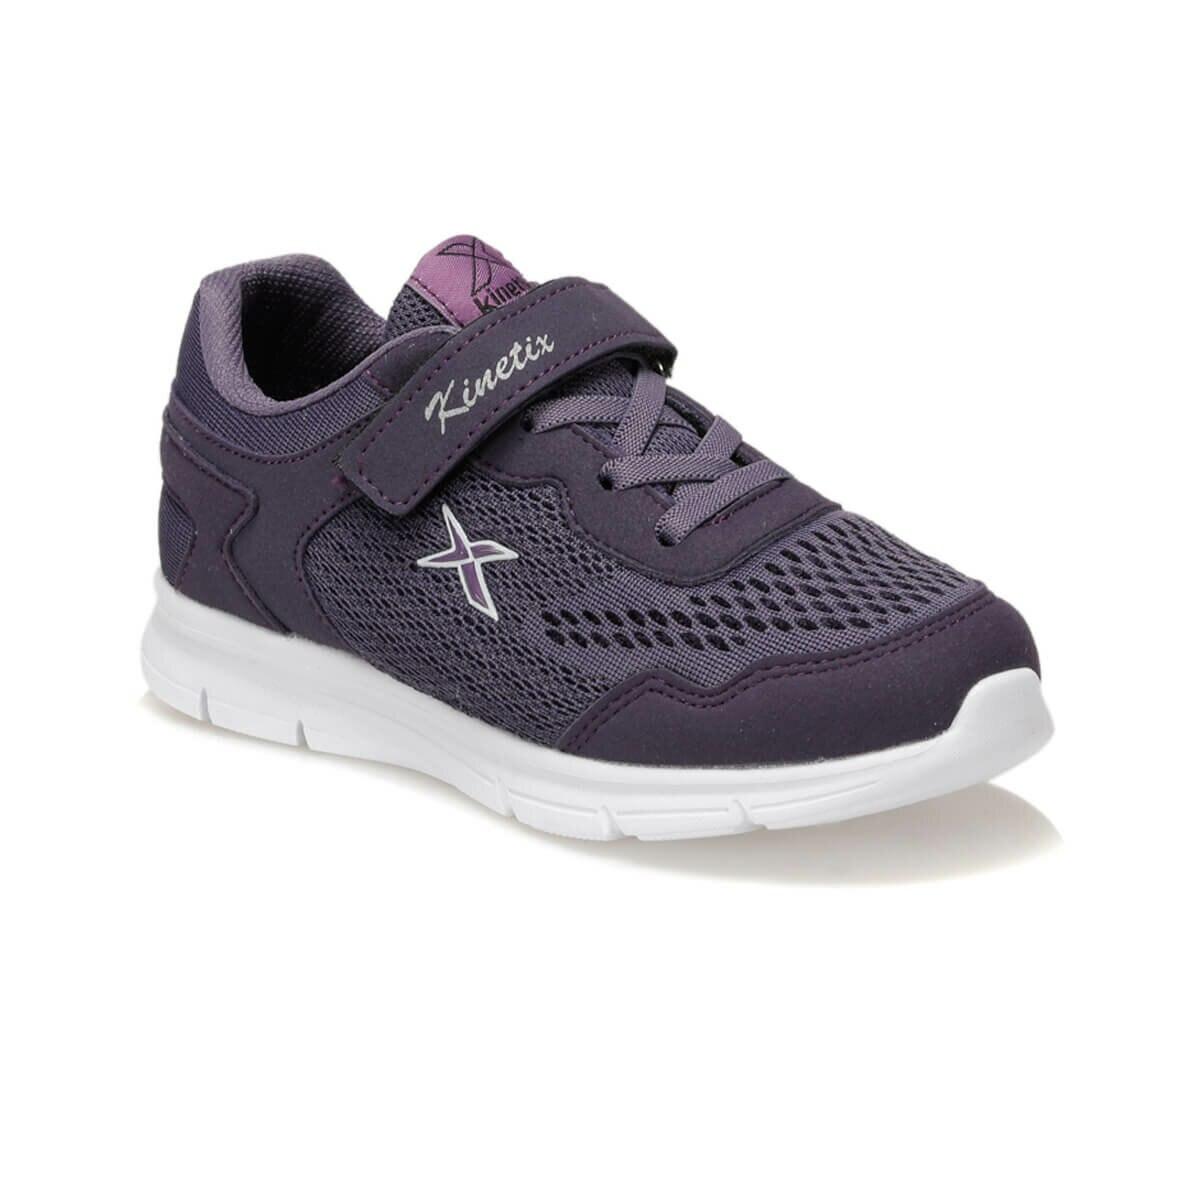 FLO ZUZEN Purple Female Child Walking Shoes KINETIX